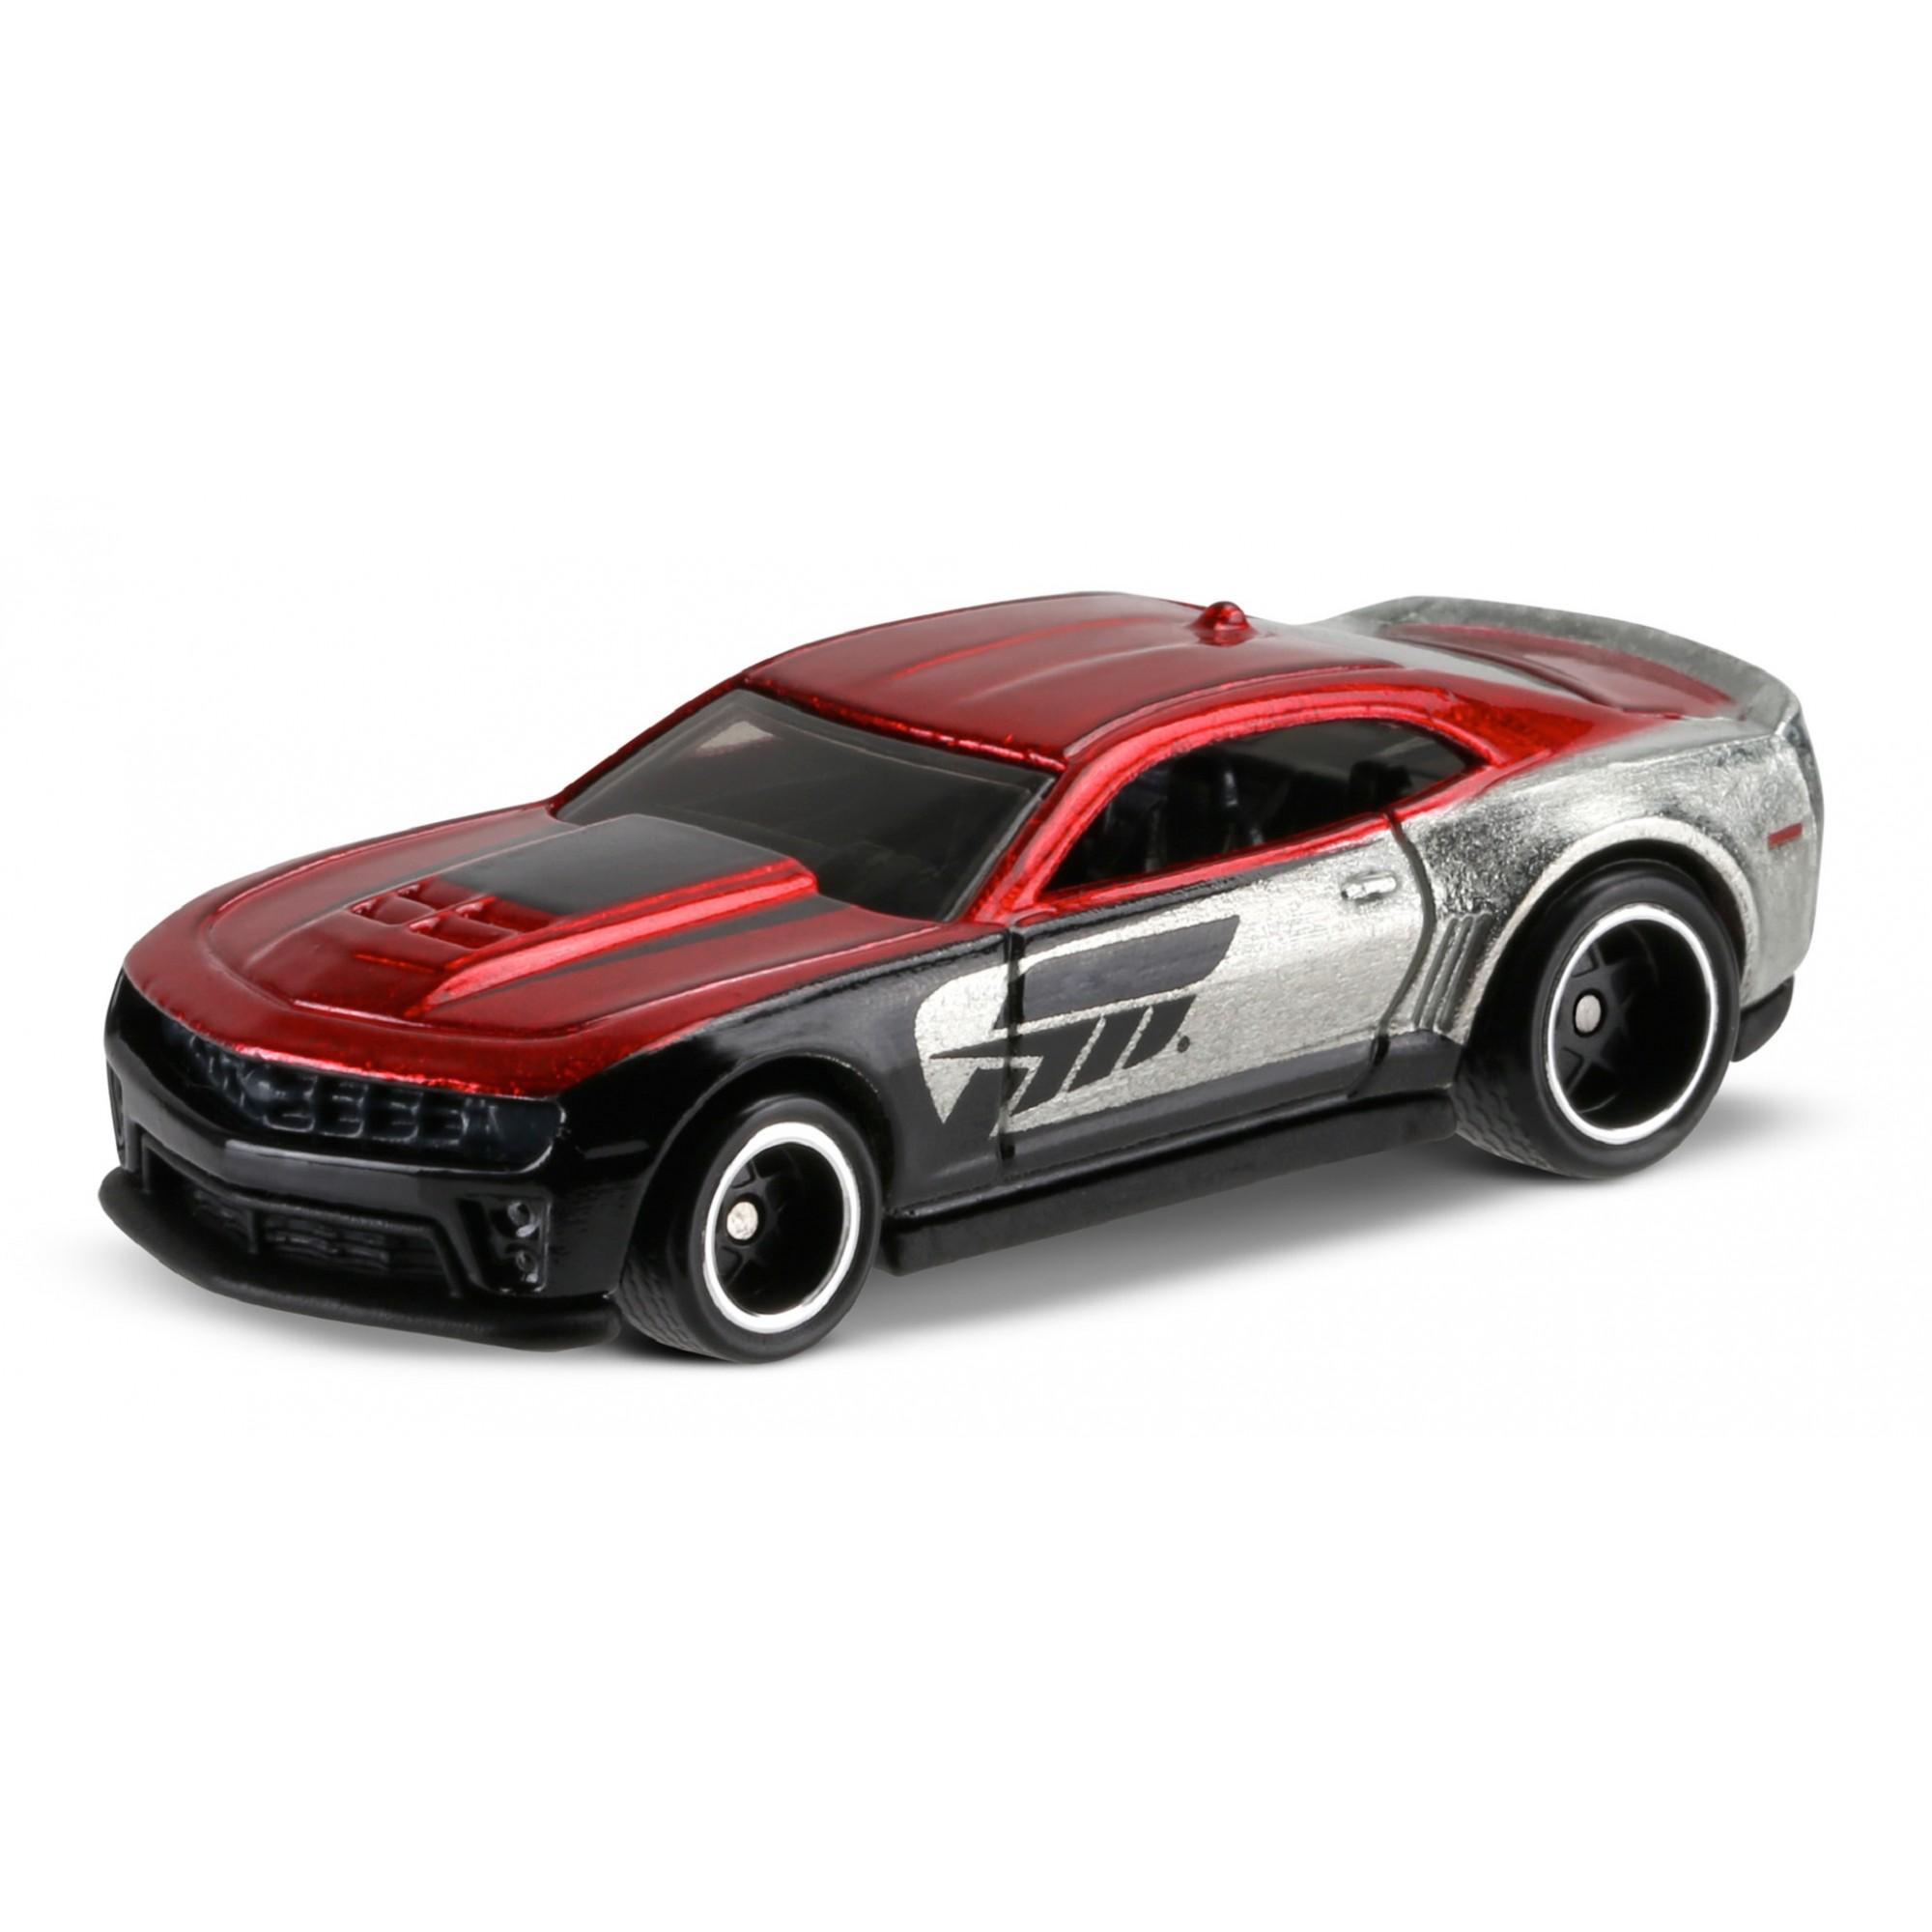 Hot Wheels Retro Entertainment Diecast Vehicle, Camaron Zl-1 by Mattel